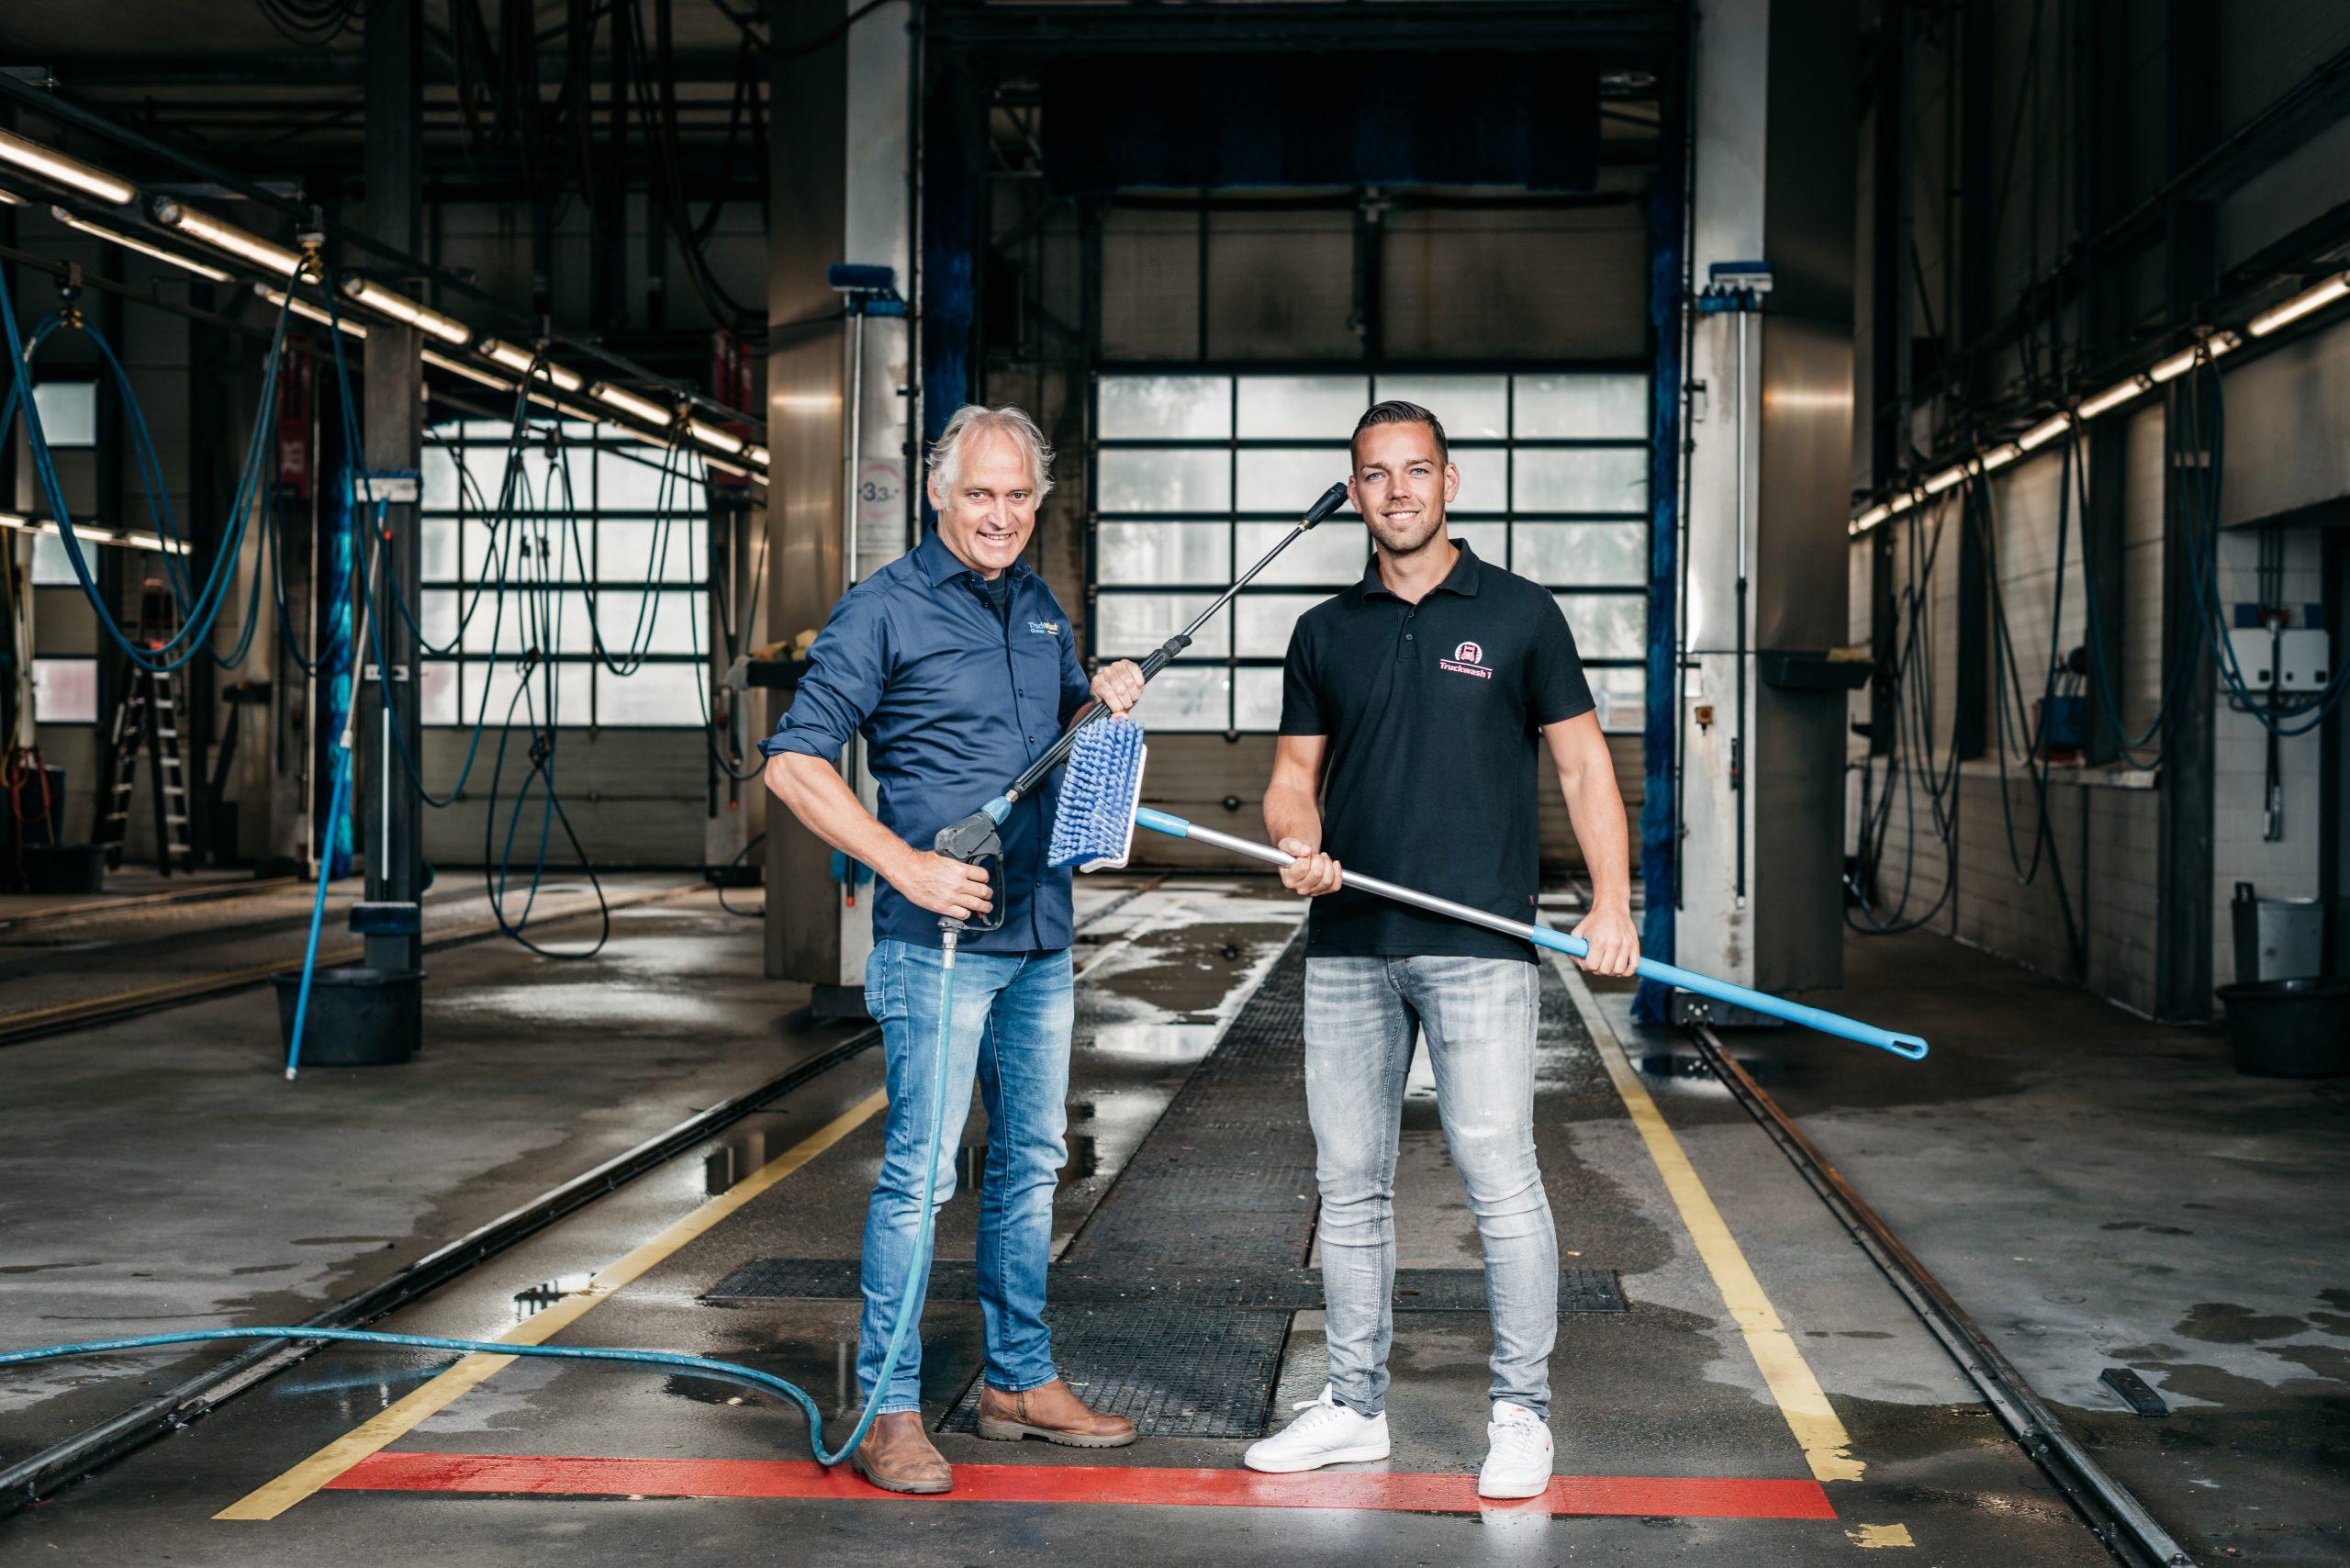 Klaus Broersma Johannes Snoek Truckwash